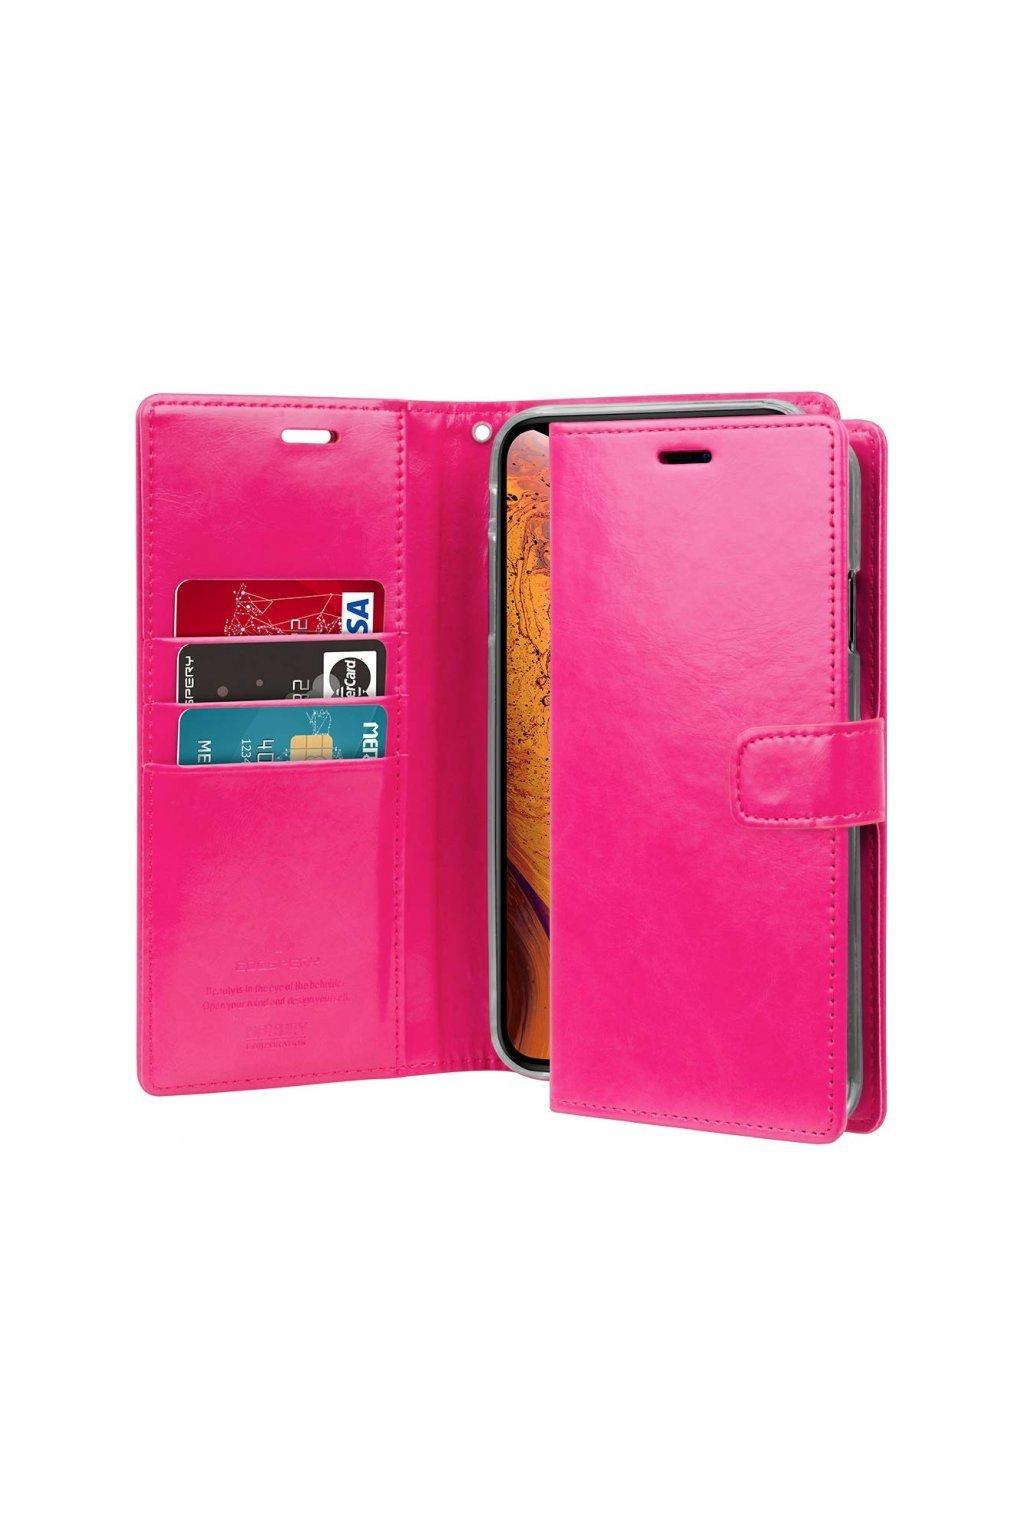 17084 pouzdro kryt pro iphone xs max mercury bluemoon diary hotpink